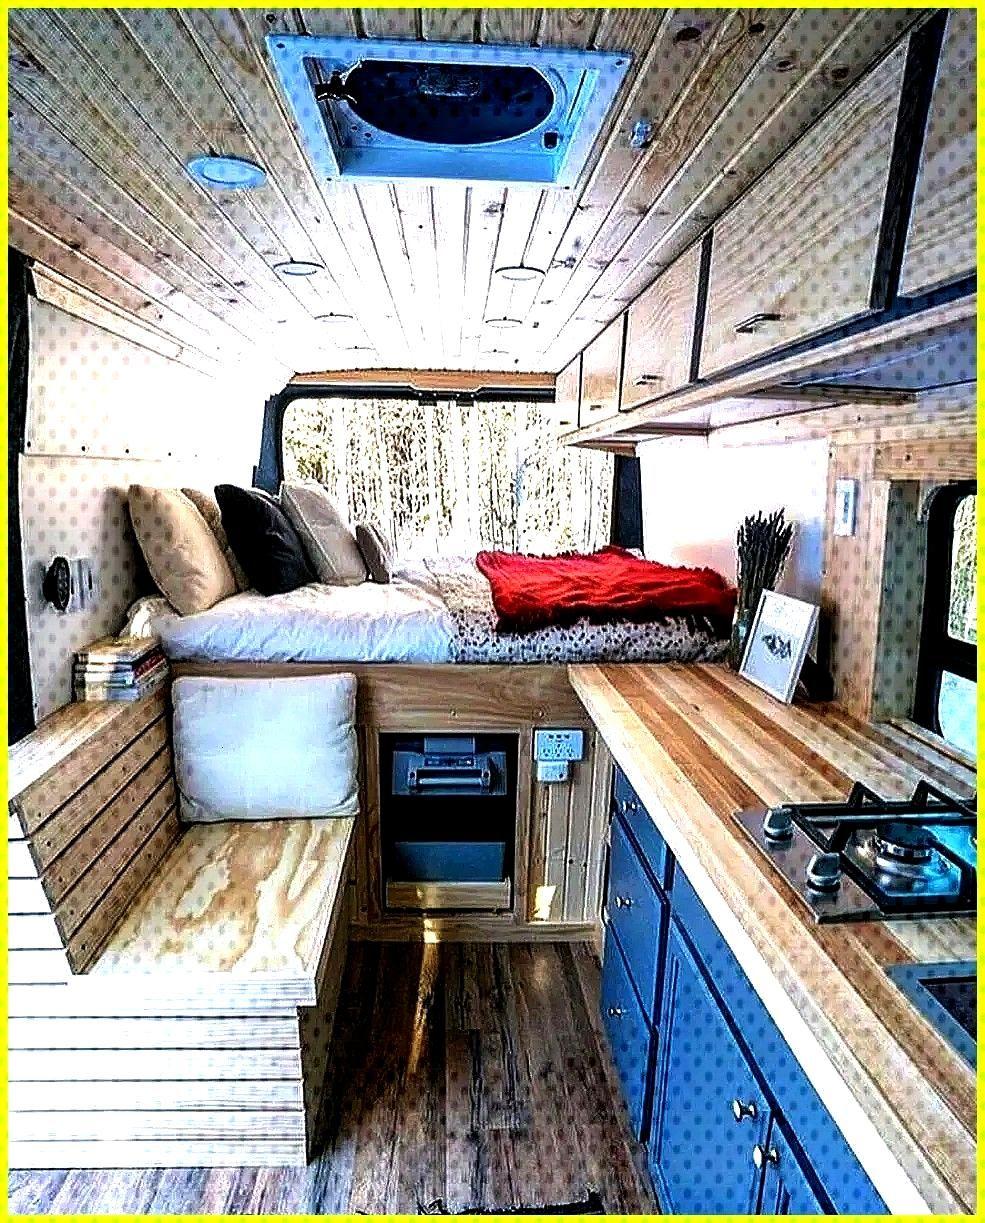 The Perfect Way Campervan Interior Design Ideas 2 There are so many ideas on Interior Design Ideas